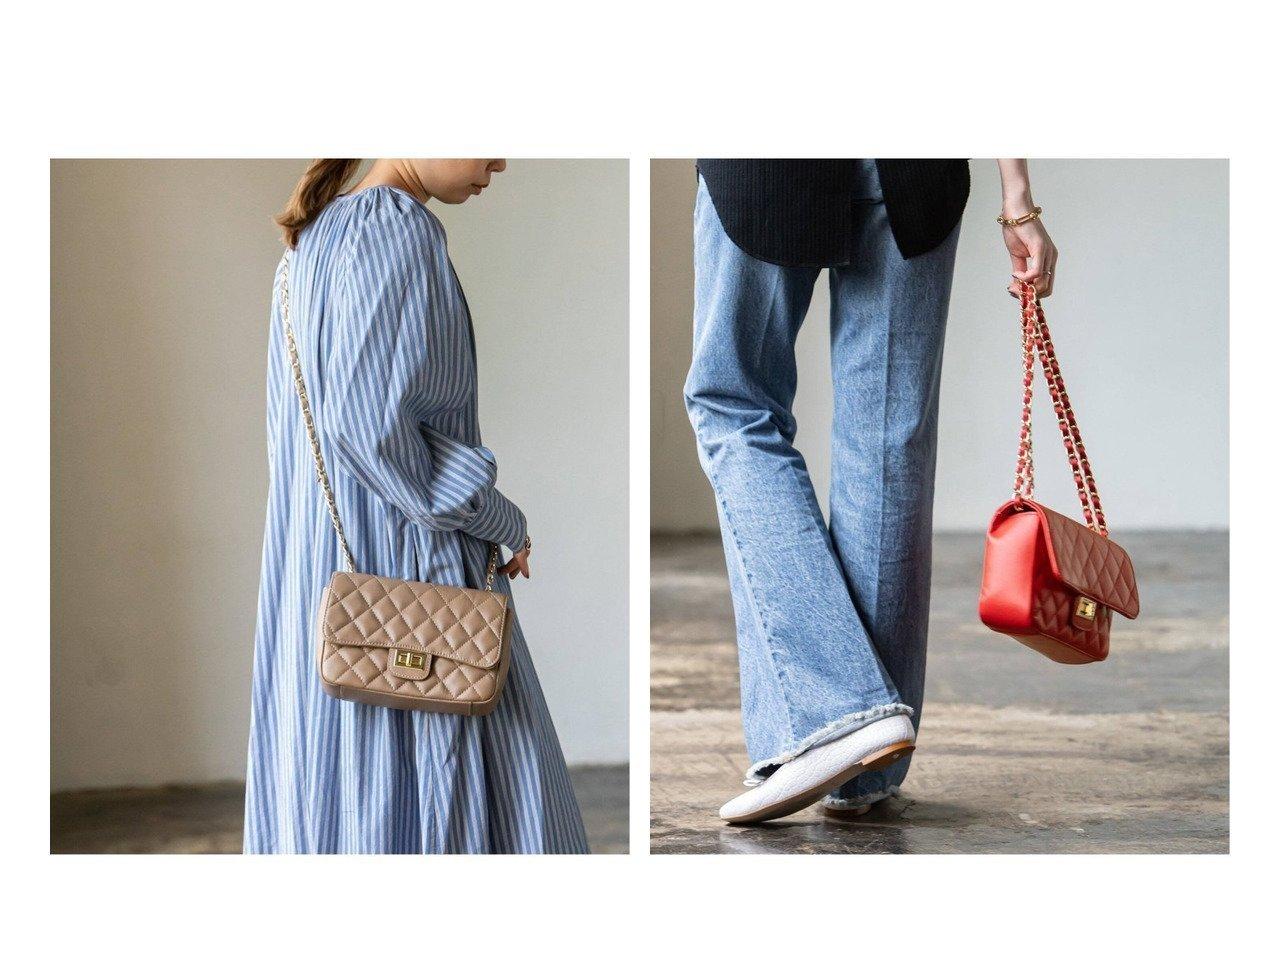 【NOBLE / Spick & Span/ノーブル / スピック&スパン】の【MAISON VINCENT】 チェーンバッグ 【バッグ・鞄】おすすめ!人気、トレンド・レディースファッションの通販 おすすめで人気の流行・トレンド、ファッションの通販商品 インテリア・家具・メンズファッション・キッズファッション・レディースファッション・服の通販 founy(ファニー) https://founy.com/ ファッション Fashion レディースファッション WOMEN バッグ Bag 2021年 2021 2021春夏・S/S SS/Spring/Summer/2021 S/S・春夏 SS・Spring/Summer チェーン 再入荷 Restock/Back in Stock/Re Arrival  ID:crp329100000055432